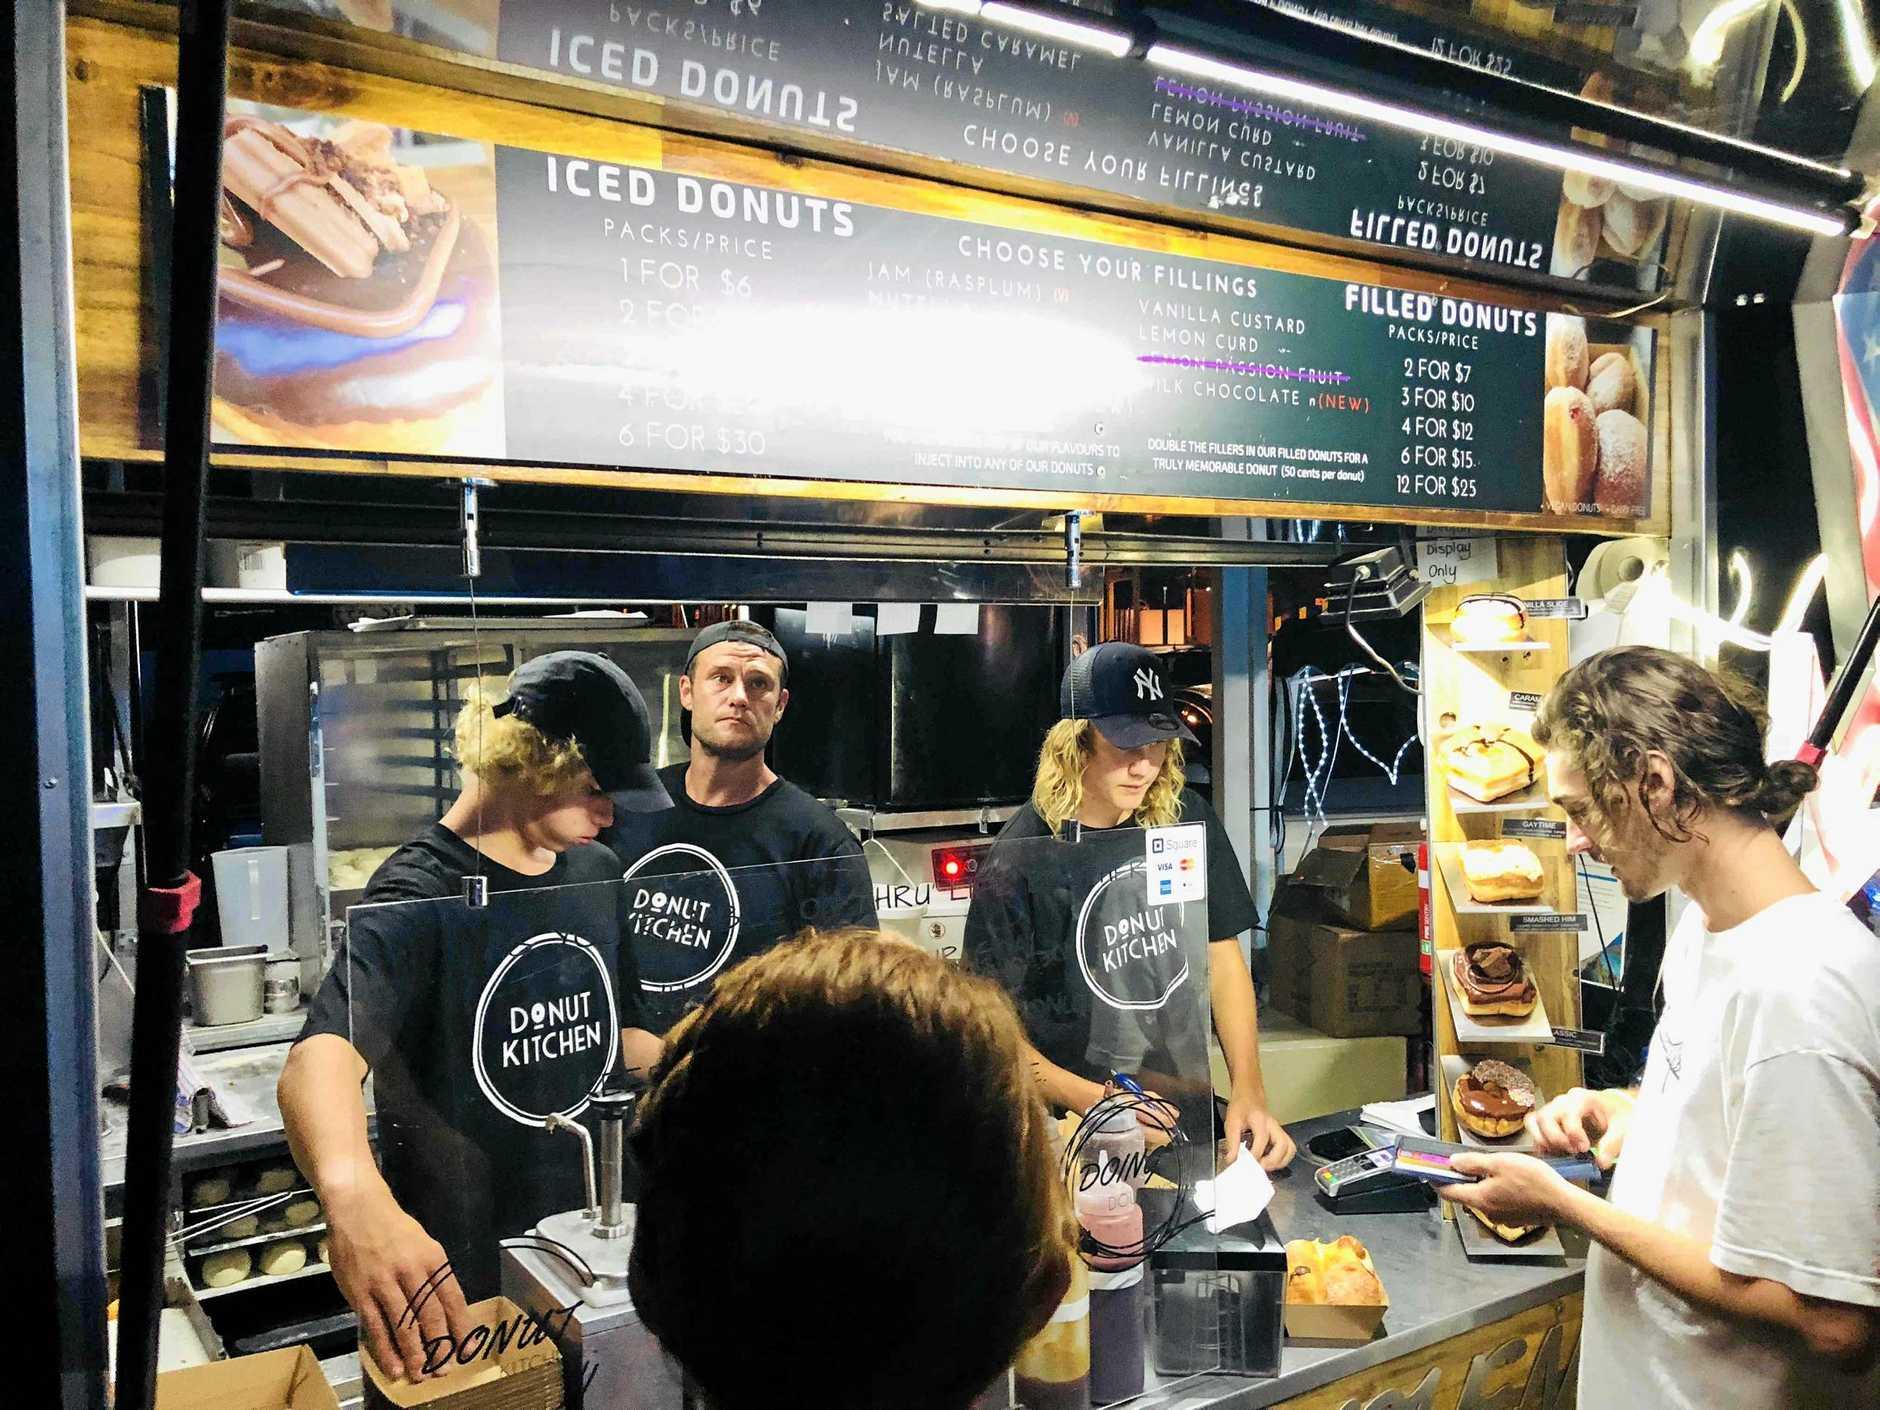 The Donut Kitchen does a roaring trade each Sunday at Caloundra Street Fair.